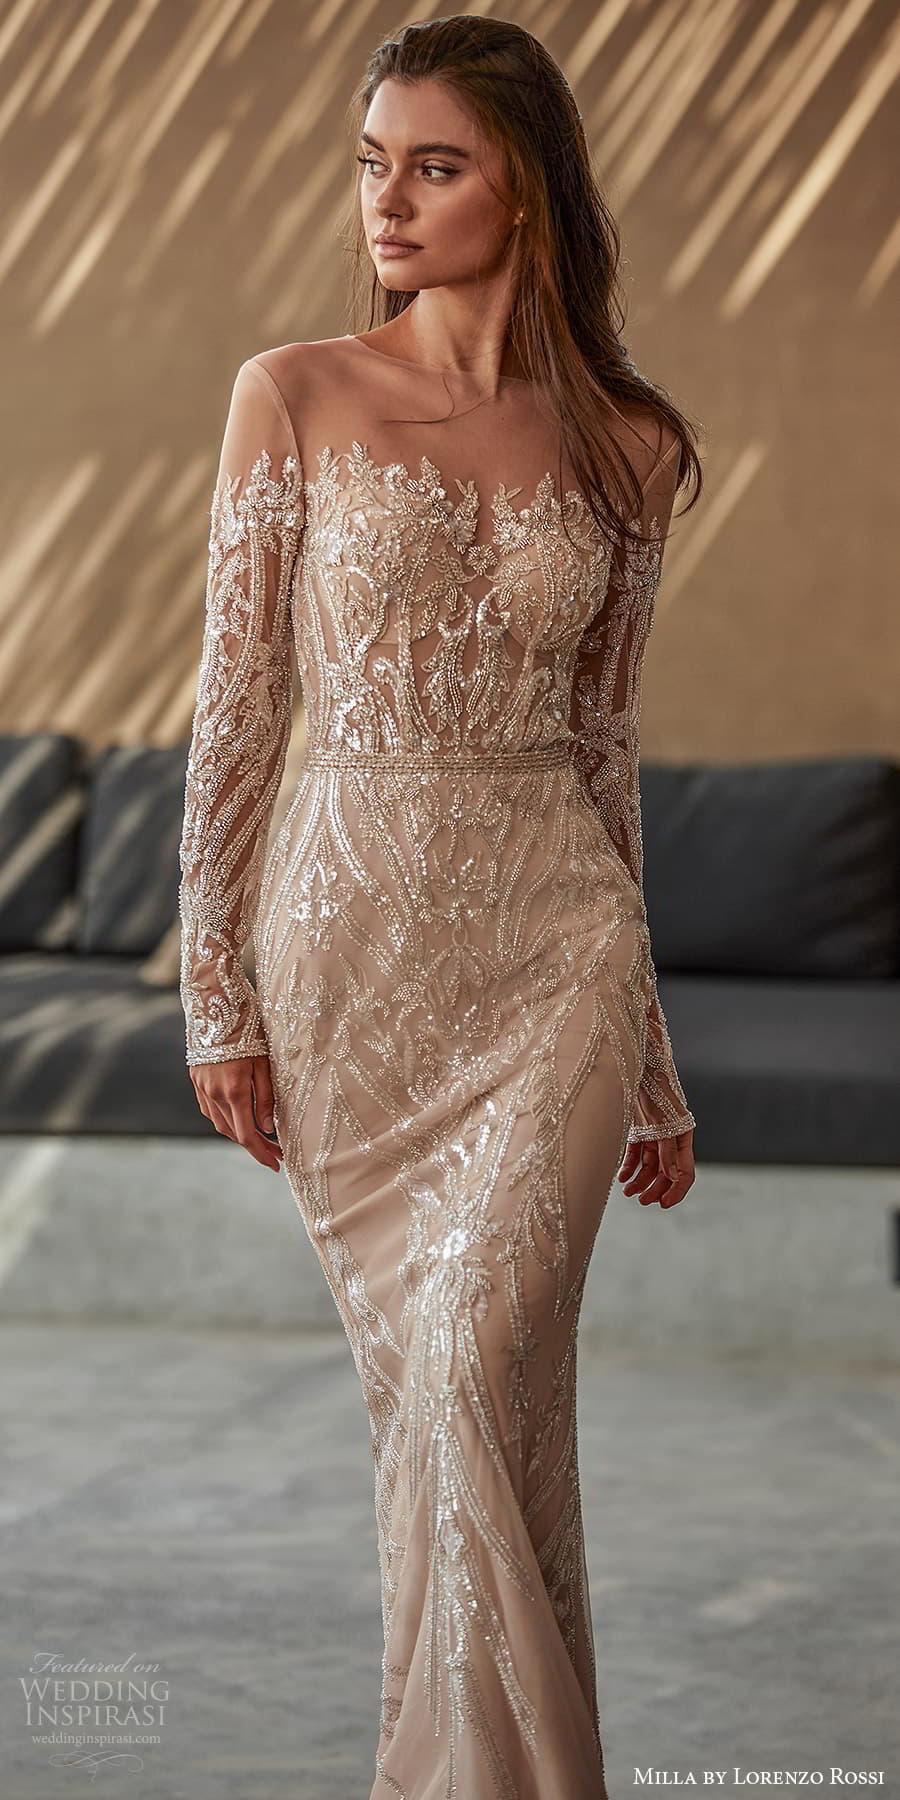 milla lorenzo rossi 2022 bridal long sleeves sweetheart neckline fully embellished sheath wedding dress sweep train (10) mv